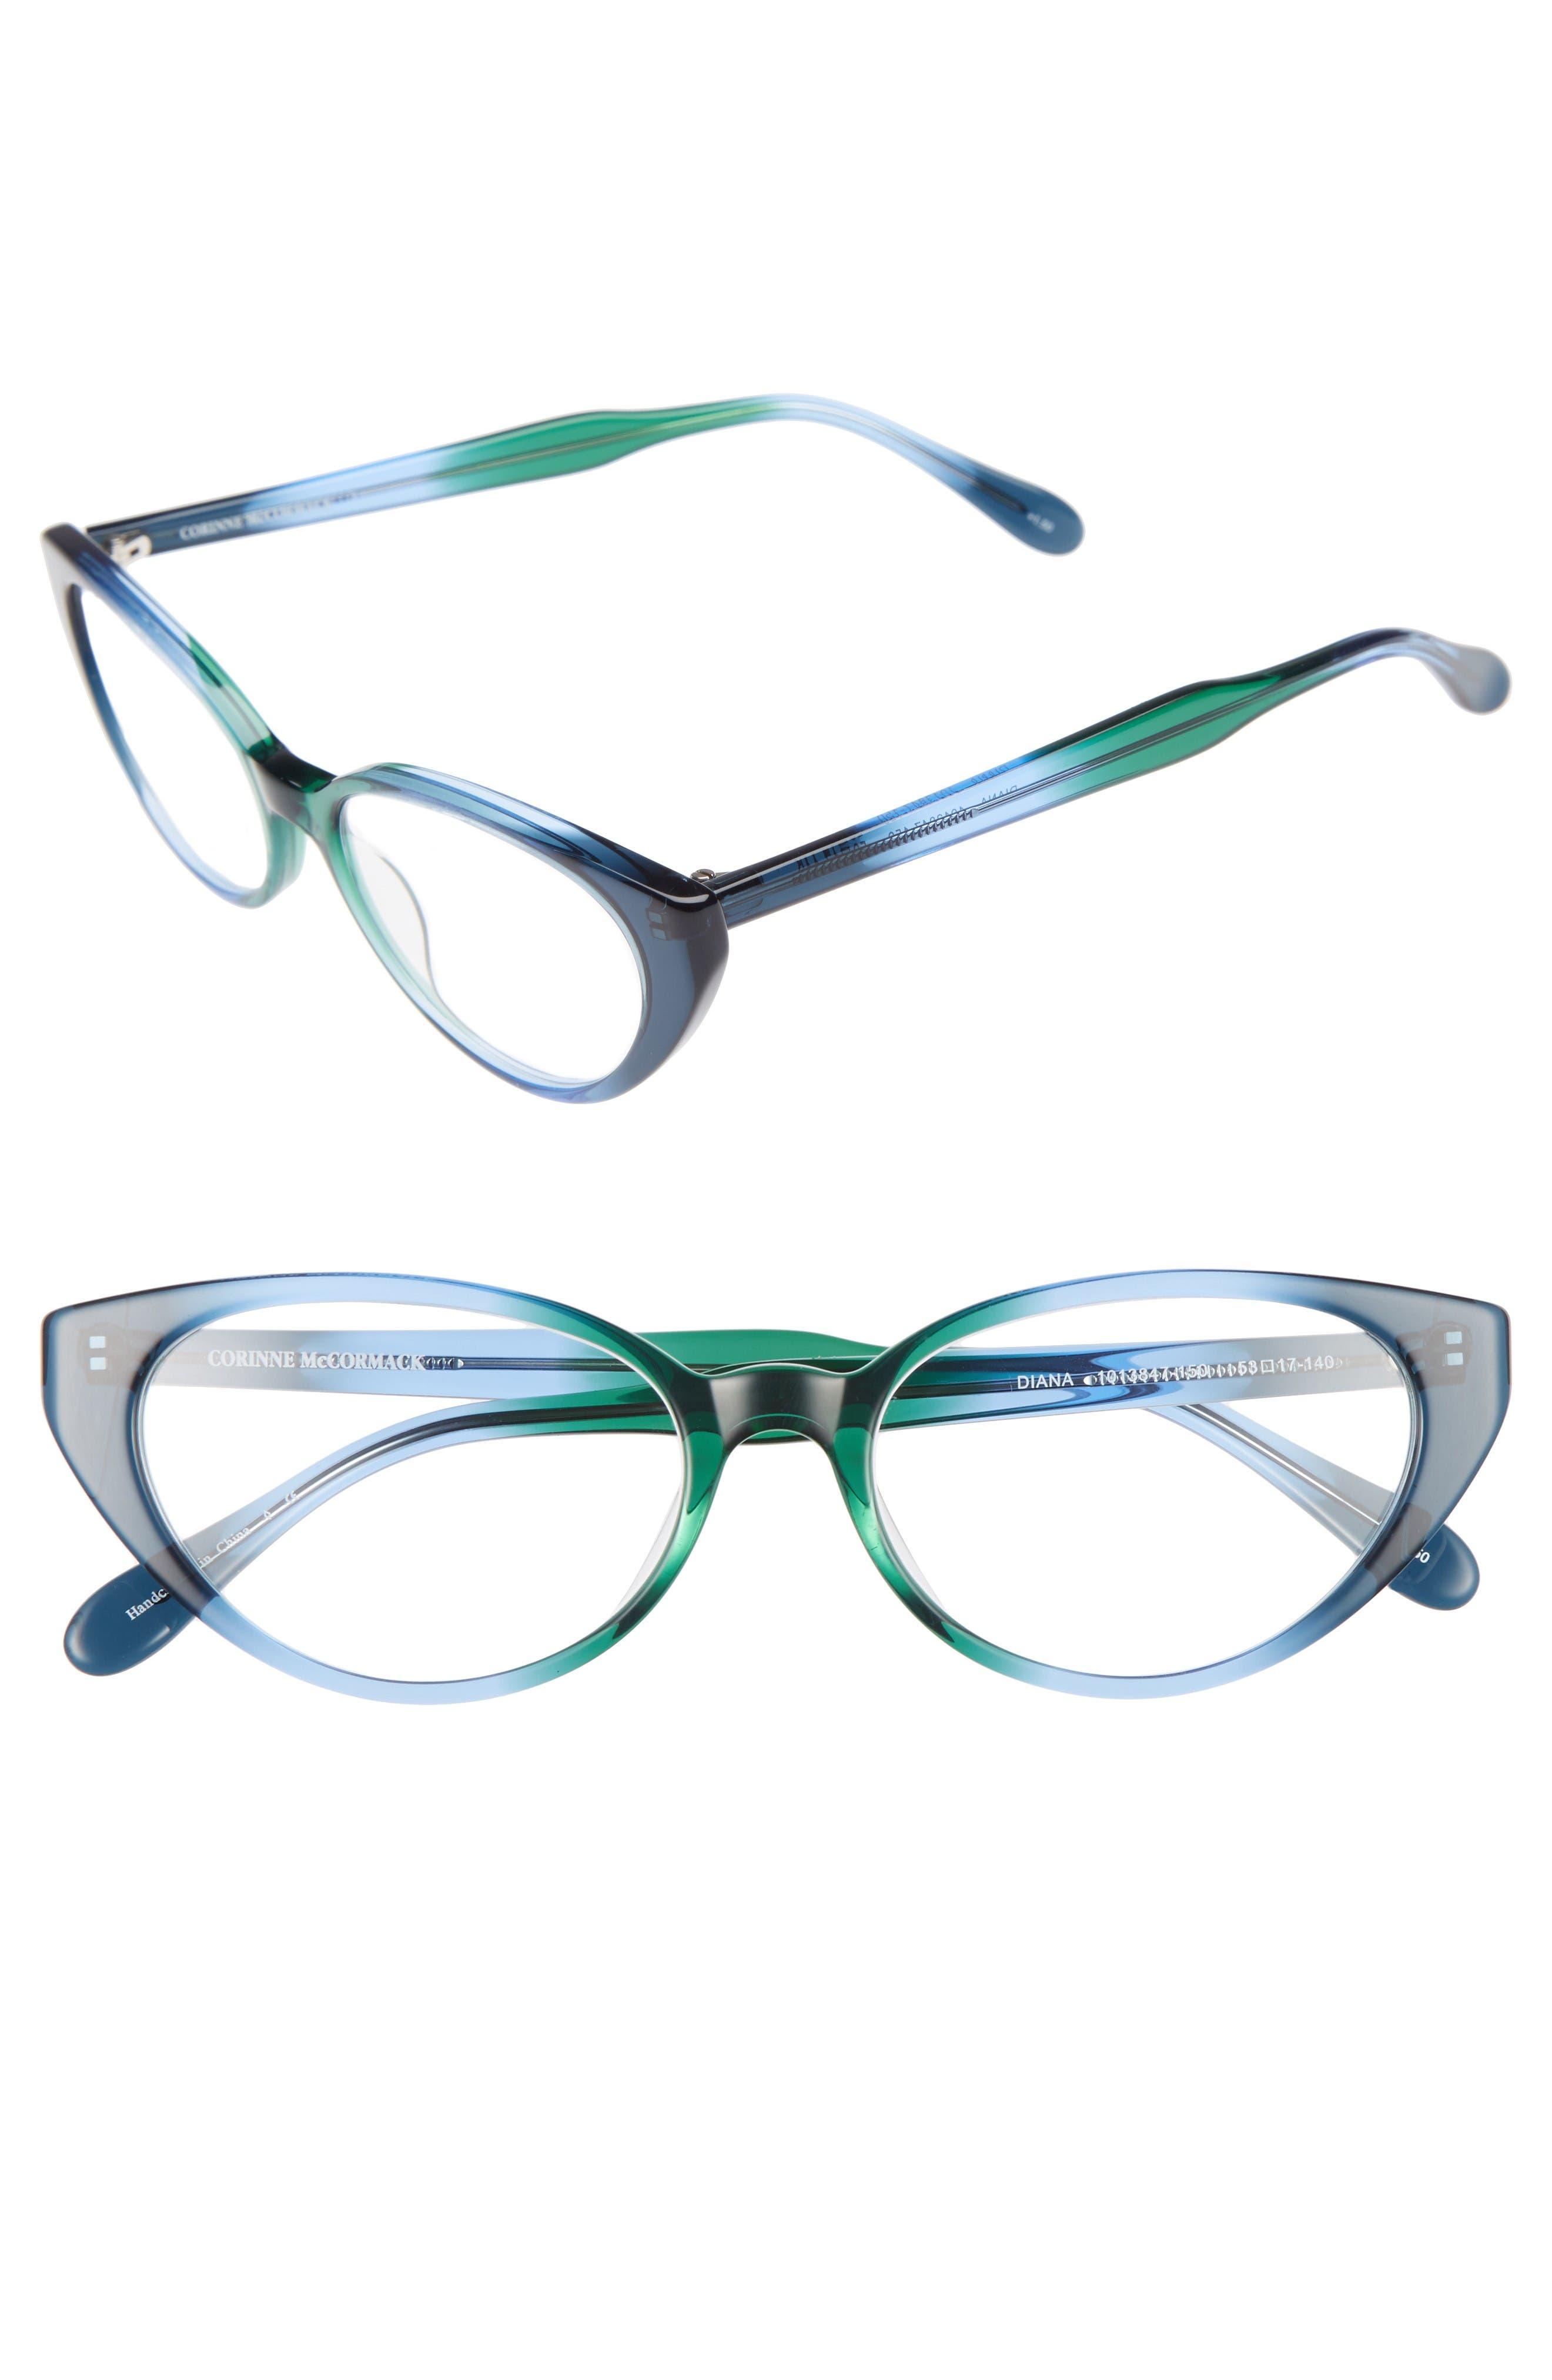 Corinne McCormack Diana 53mm Cat Eye Reading Glasses